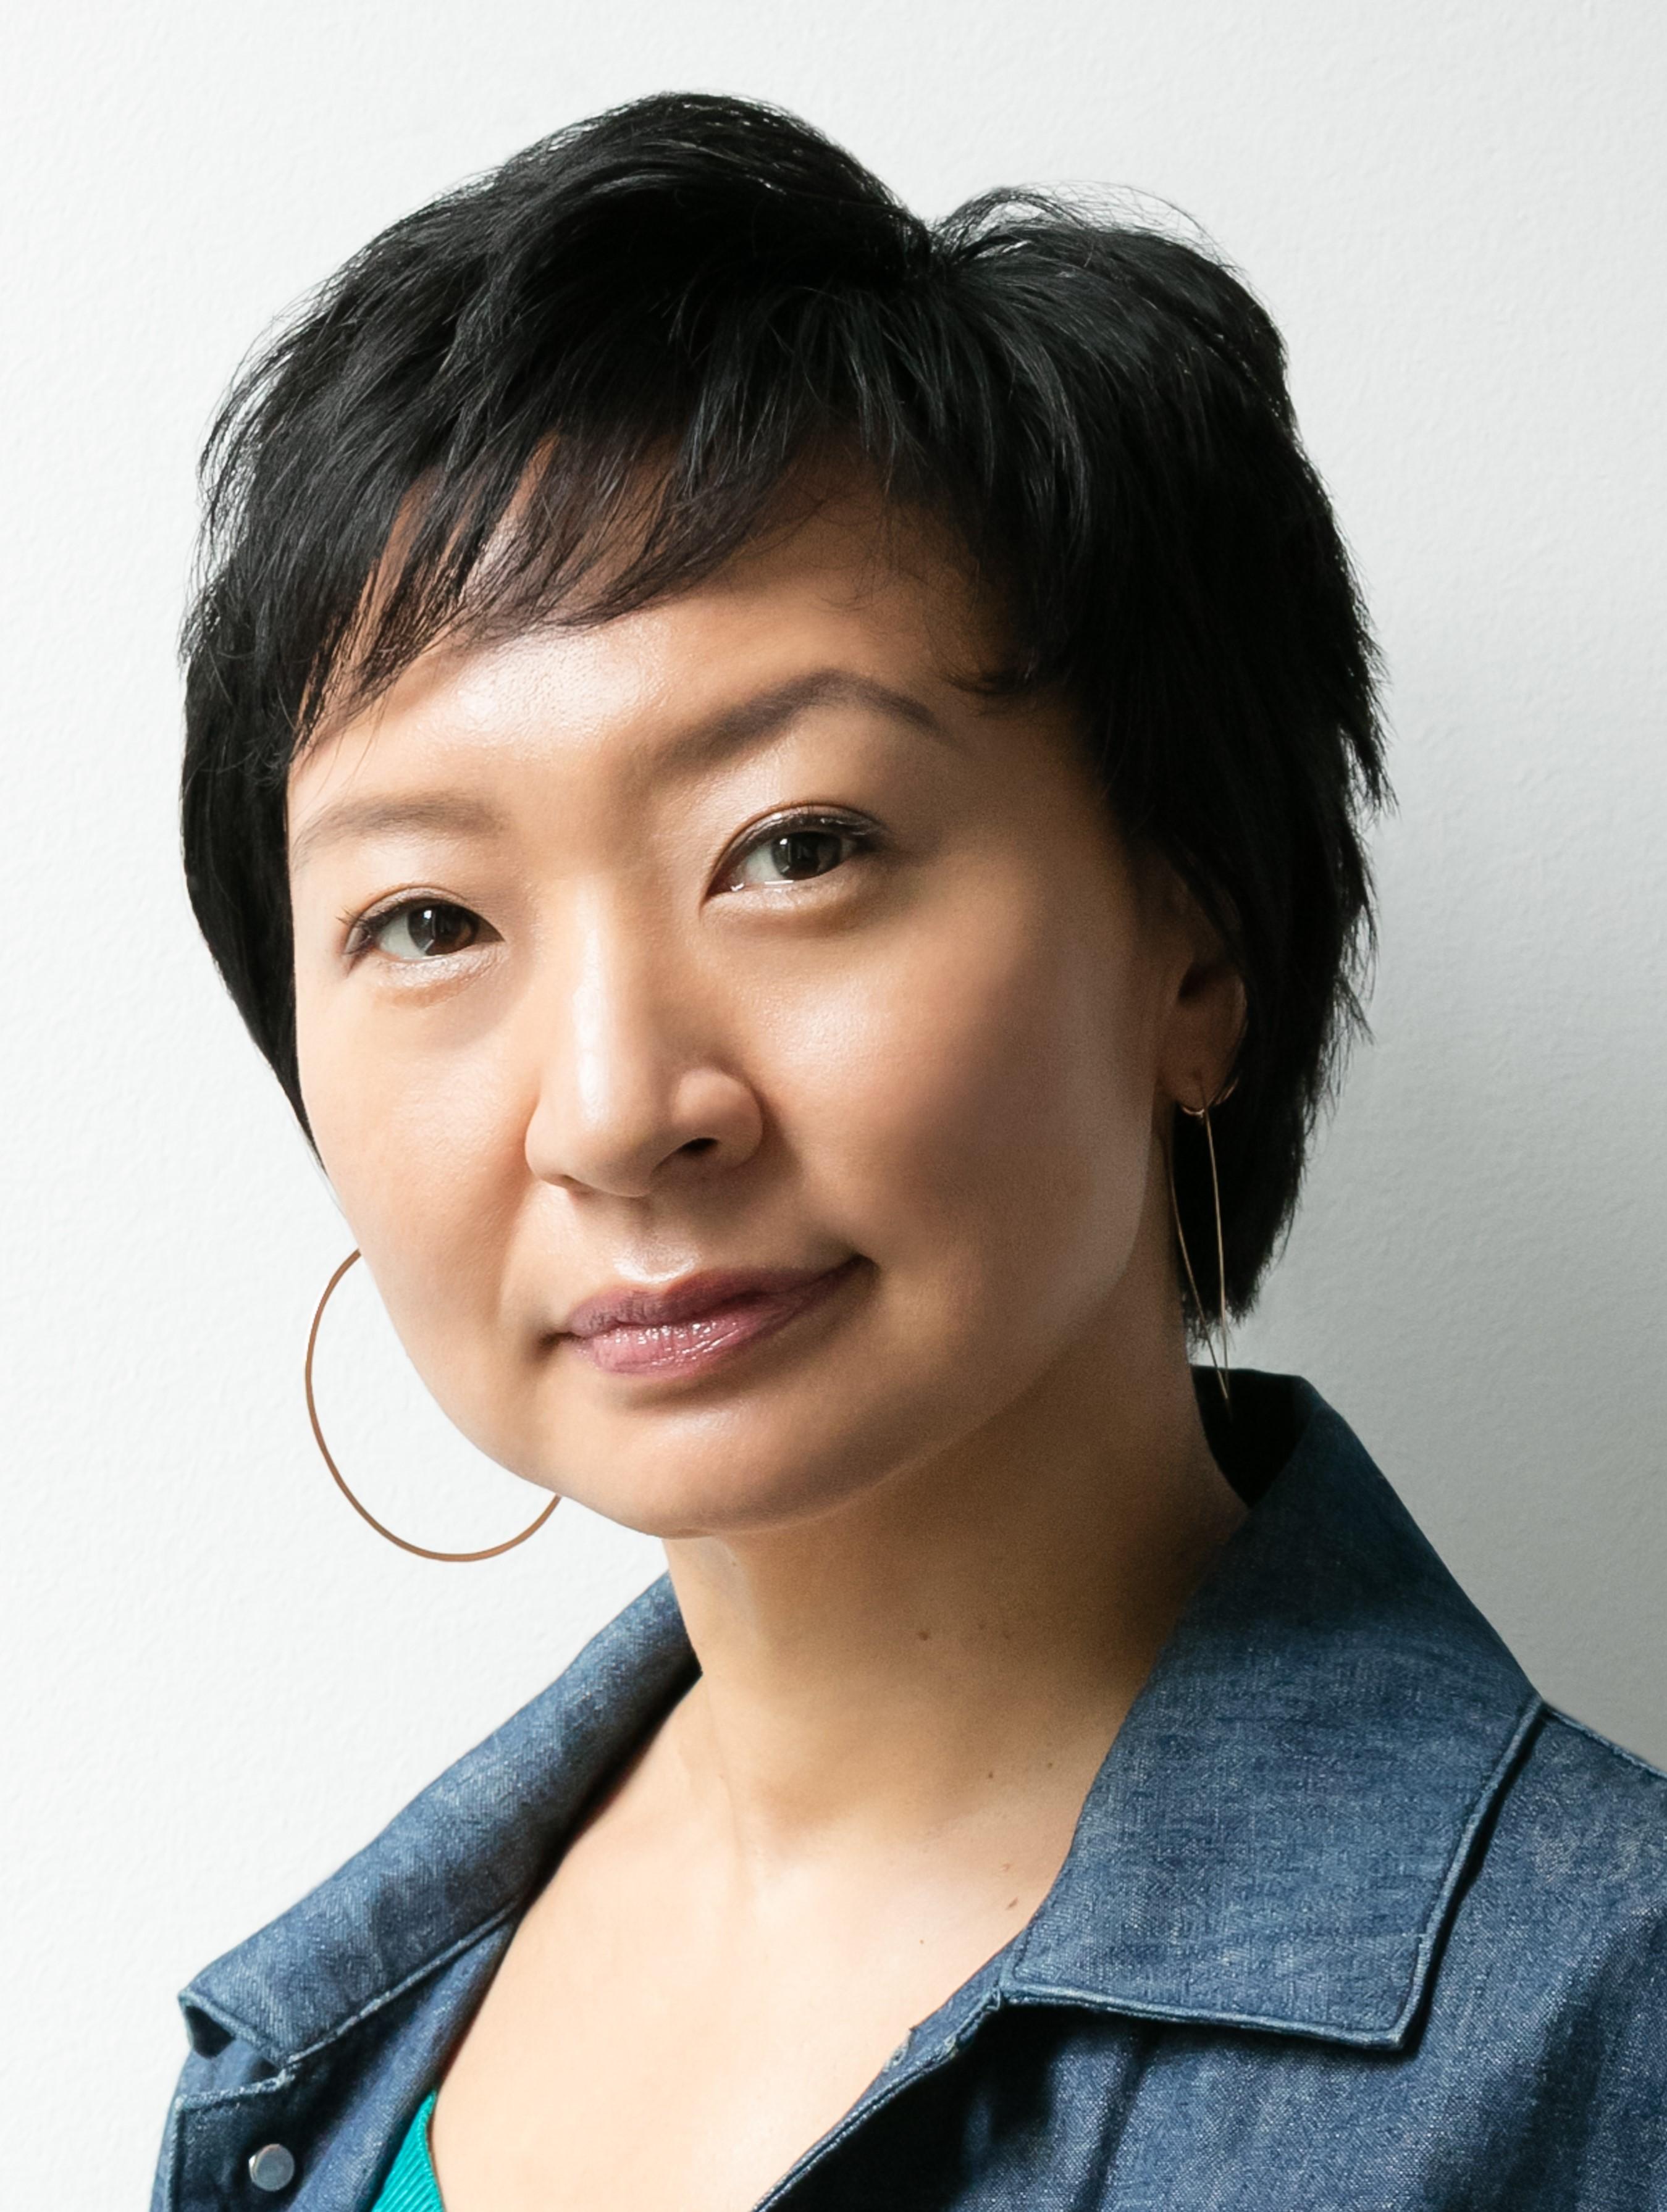 Cathy Park Hong's Headshot